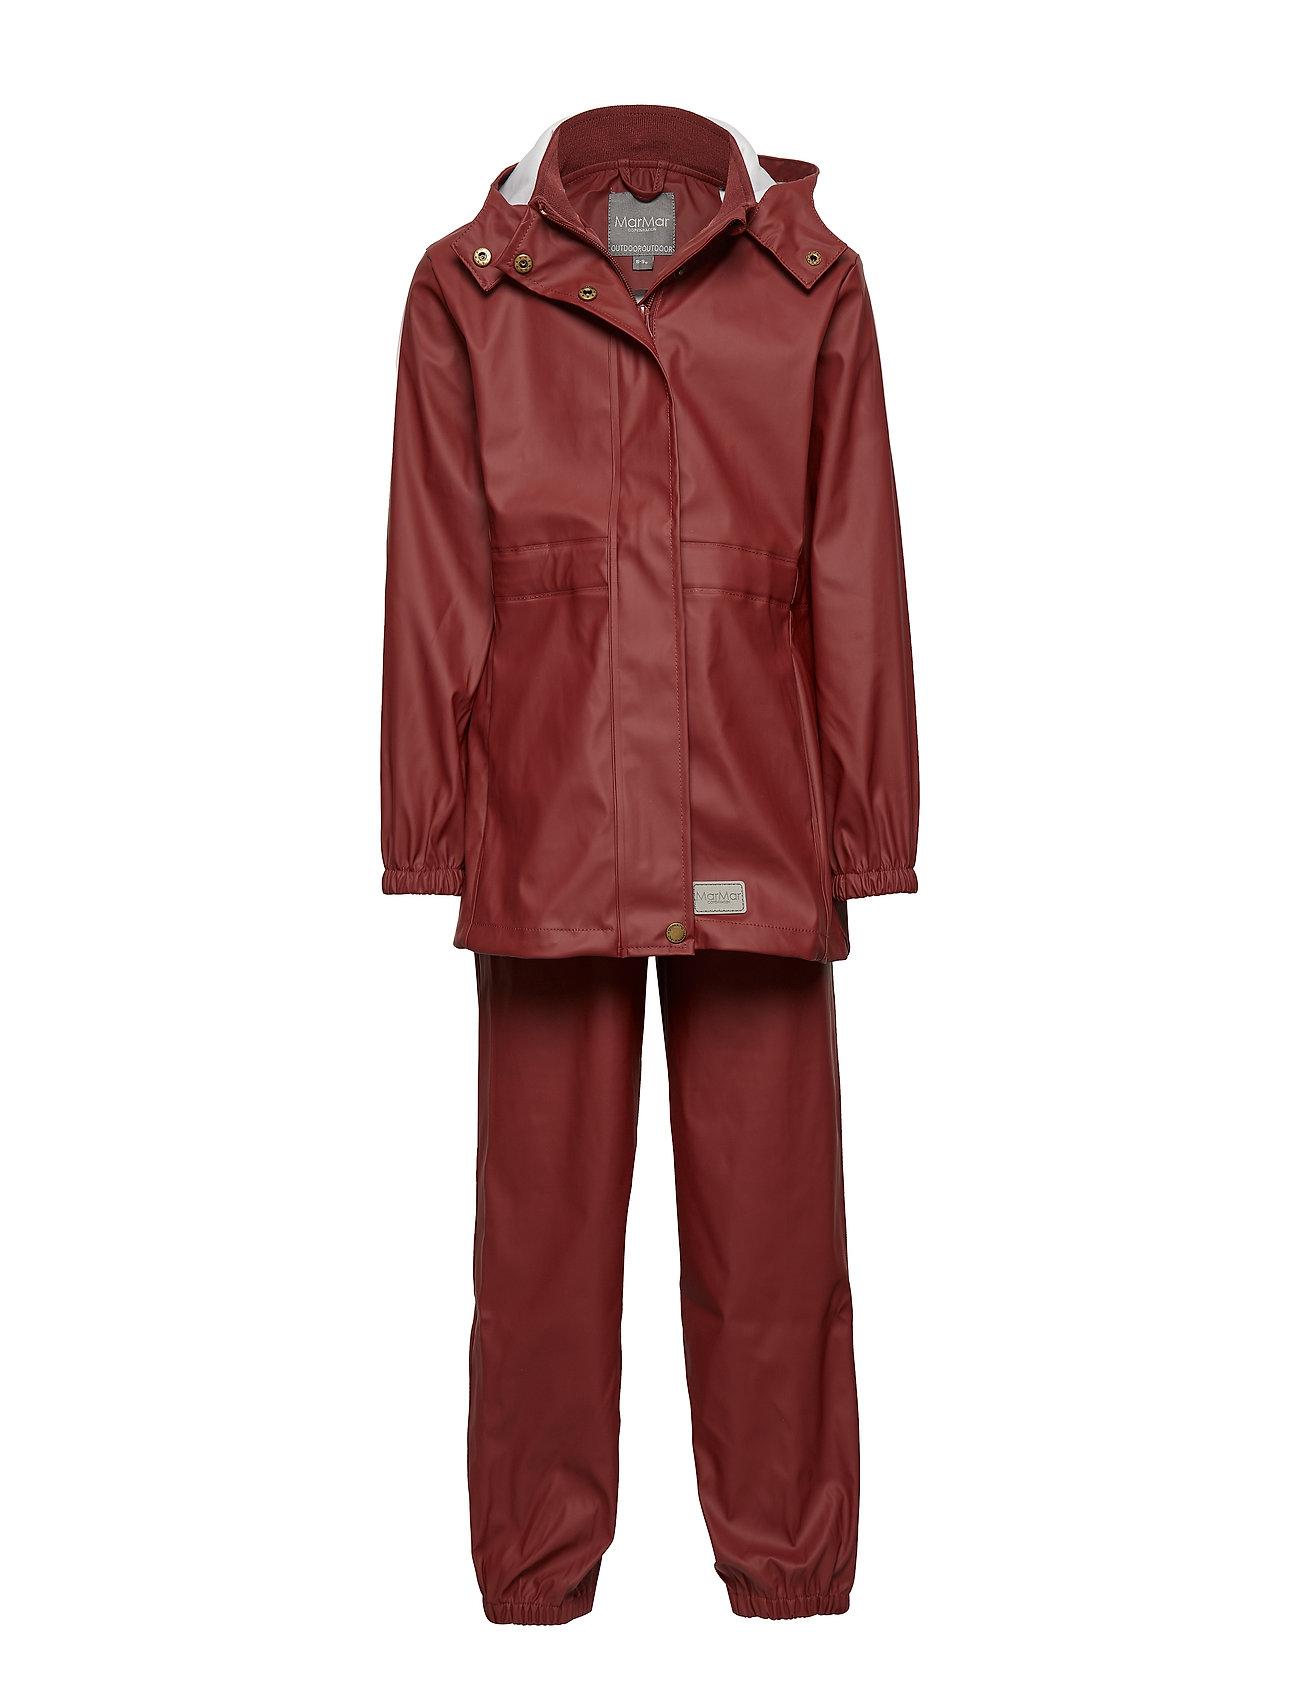 MarMar Cph Rainwear Set Kids Girl - WINE